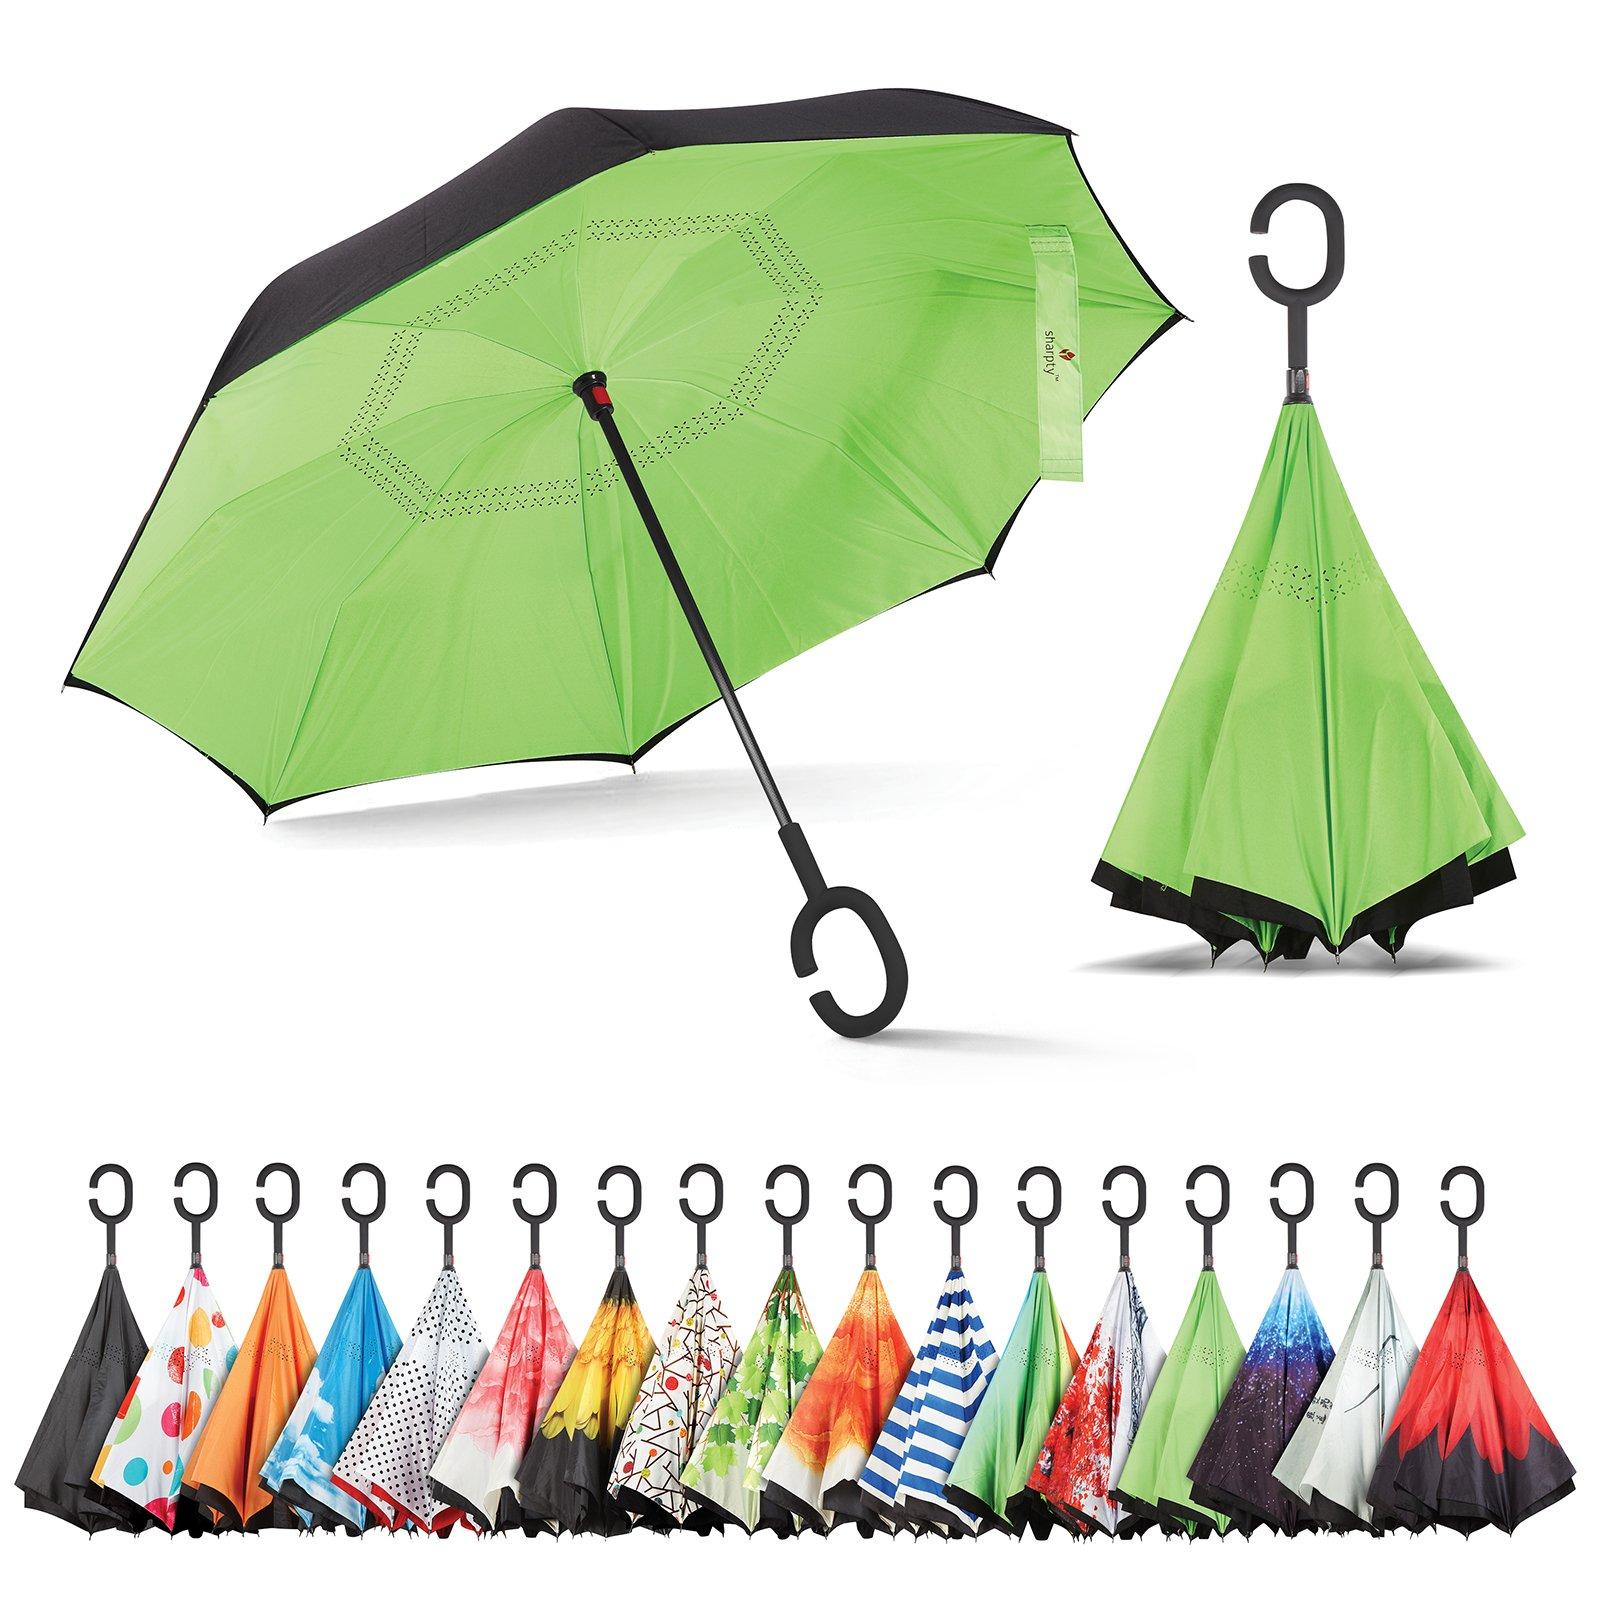 Sharpty Inverted Umbrella, Umbrella Windproof, Reverse Umbrella, Umbrellas for Women with UV Protection, Upside Down Umbrella with C-Shaped Handle (Black-Green)